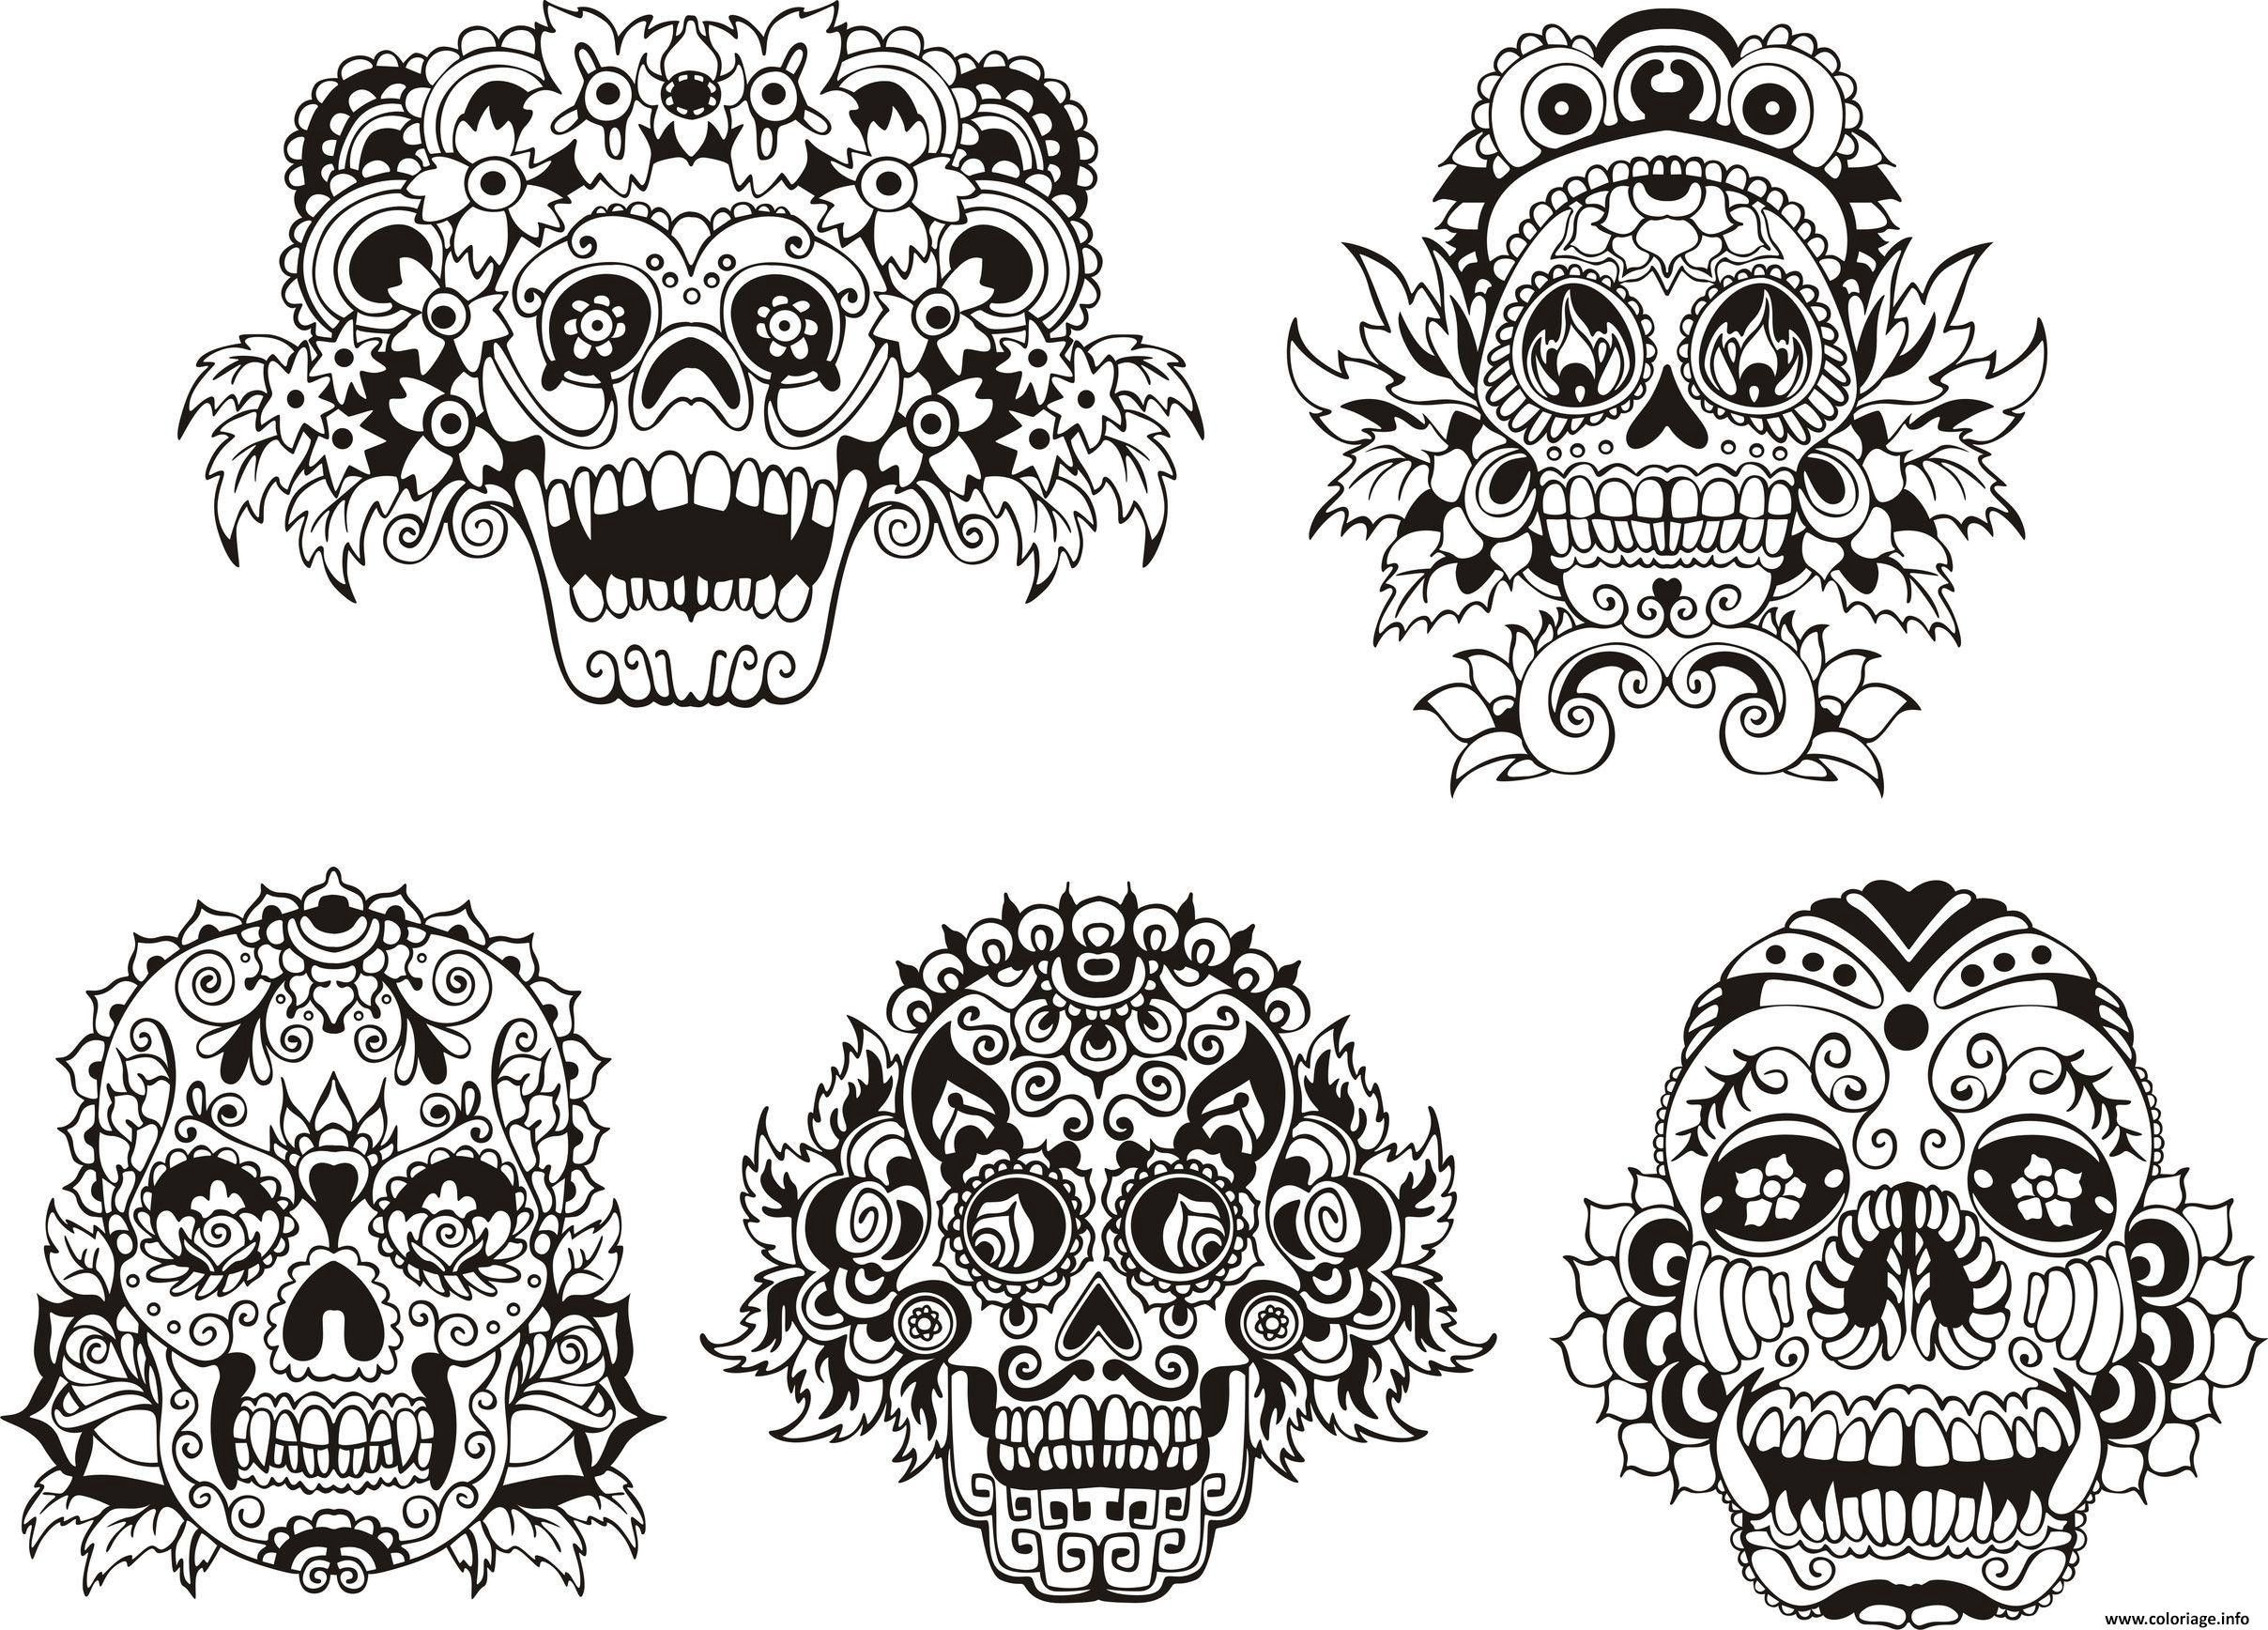 Impressionnant Coloriage à Imprimer Masque Halloween